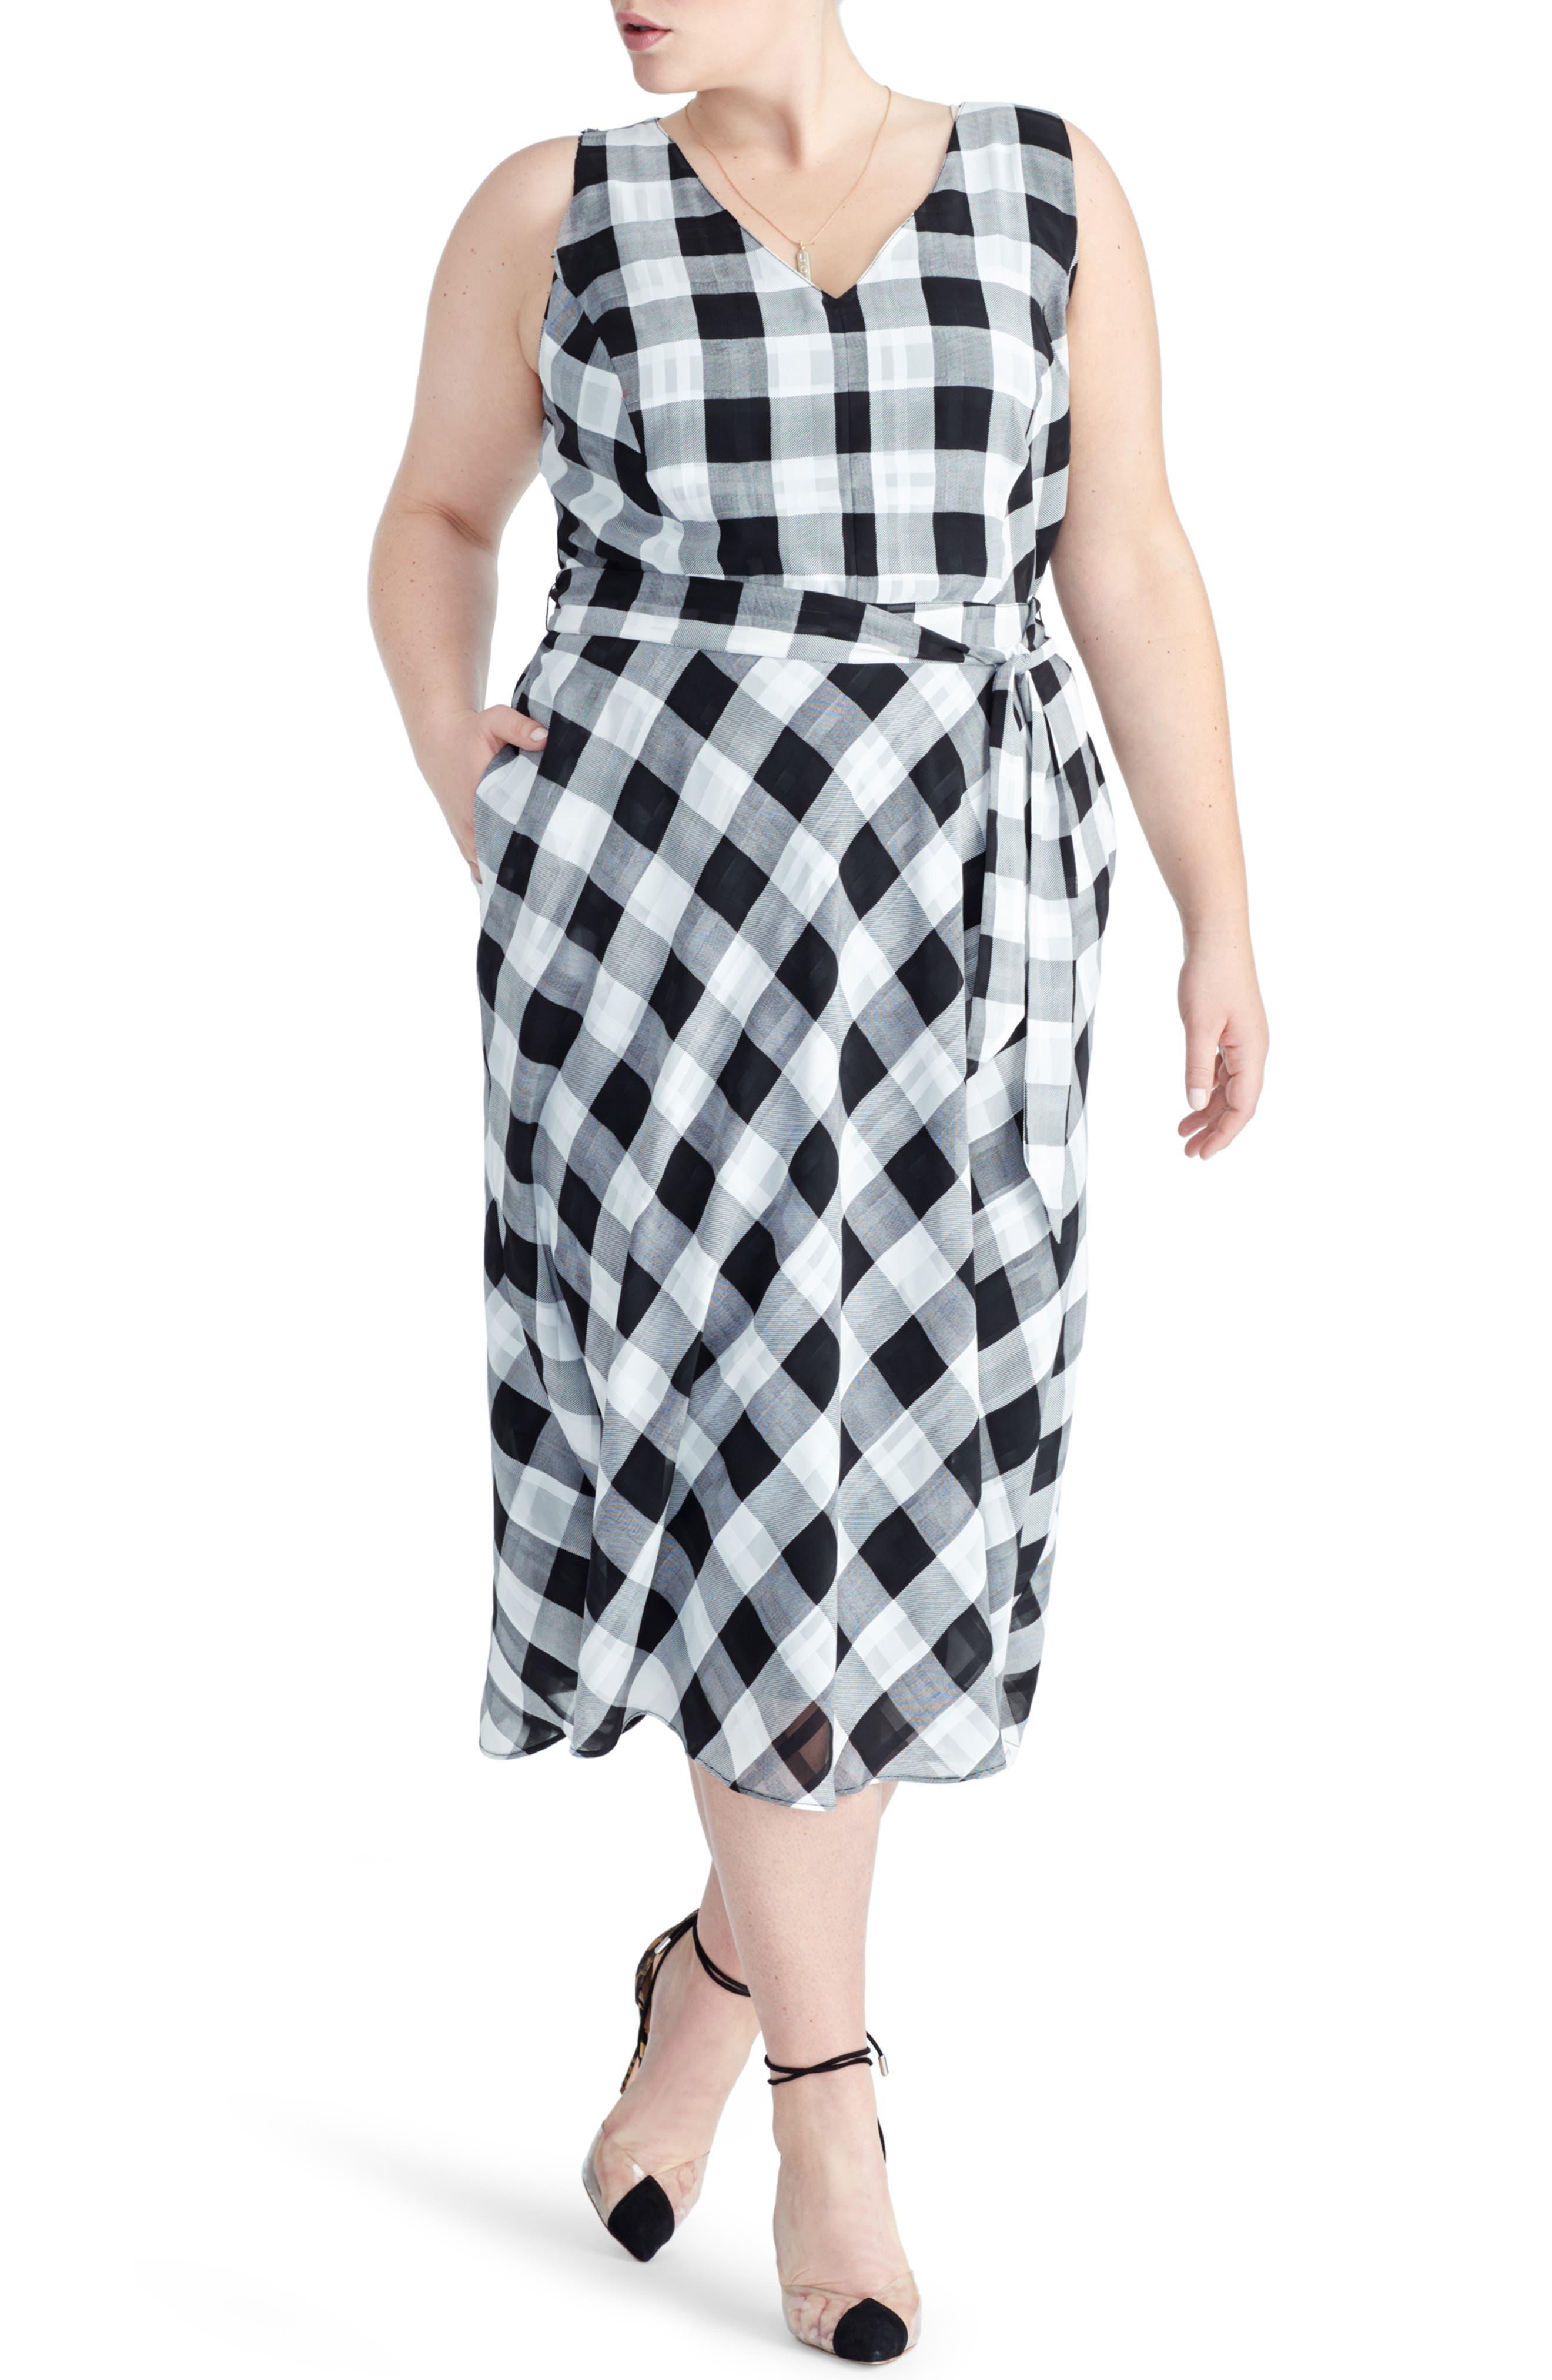 Plus Size Rachel Rachel Roy Check Print A-Line Dress, Black